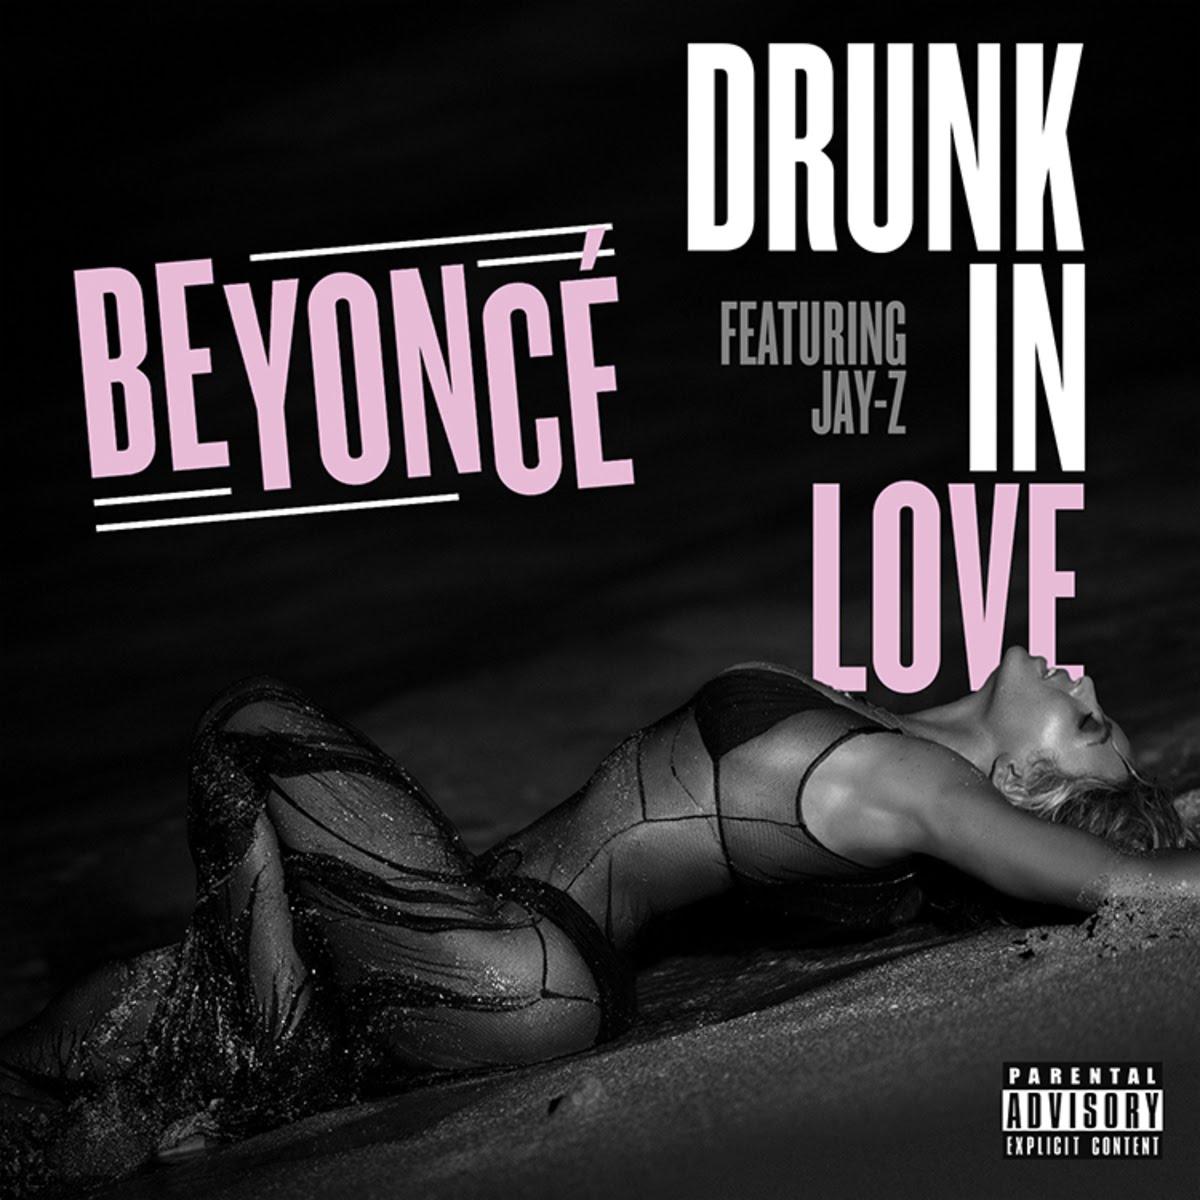 Beyoncé, Jay-Z – Drunk in Love (single cover art)